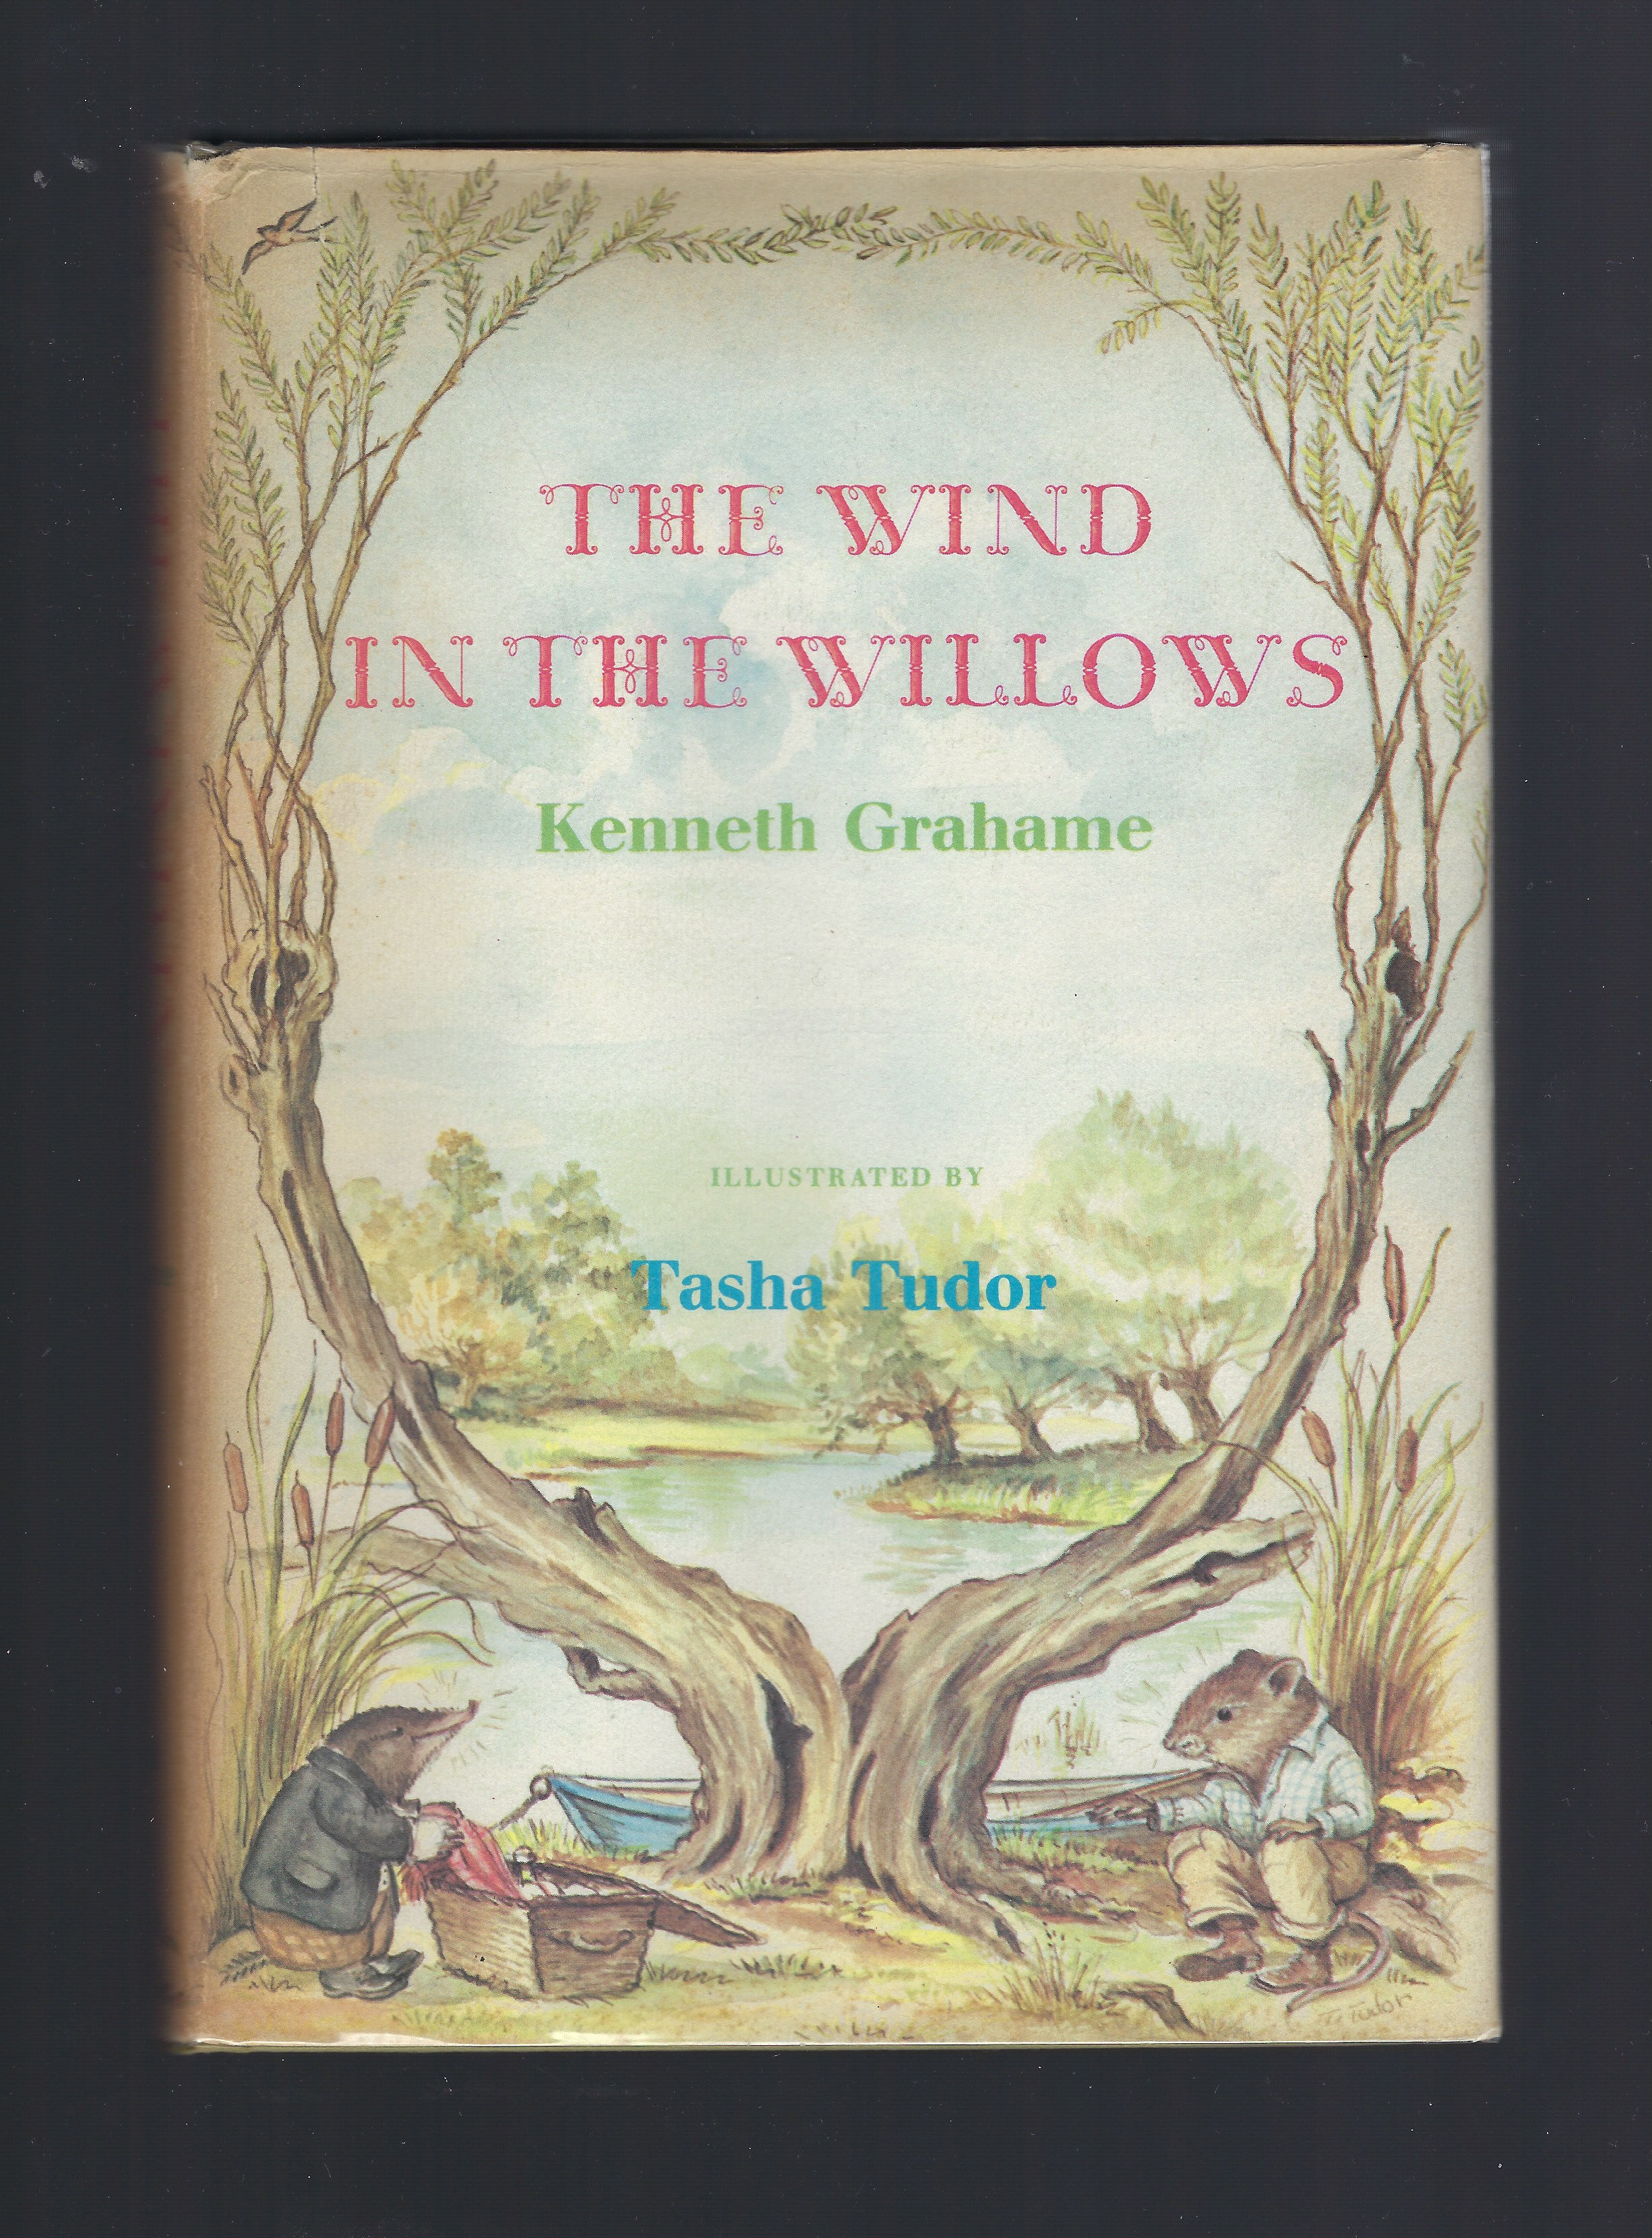 The Wind in the Willows Tasha Tudor 1966 HB/DJ, Kenneth Grahame; Tasha Tudor [Illustrator]